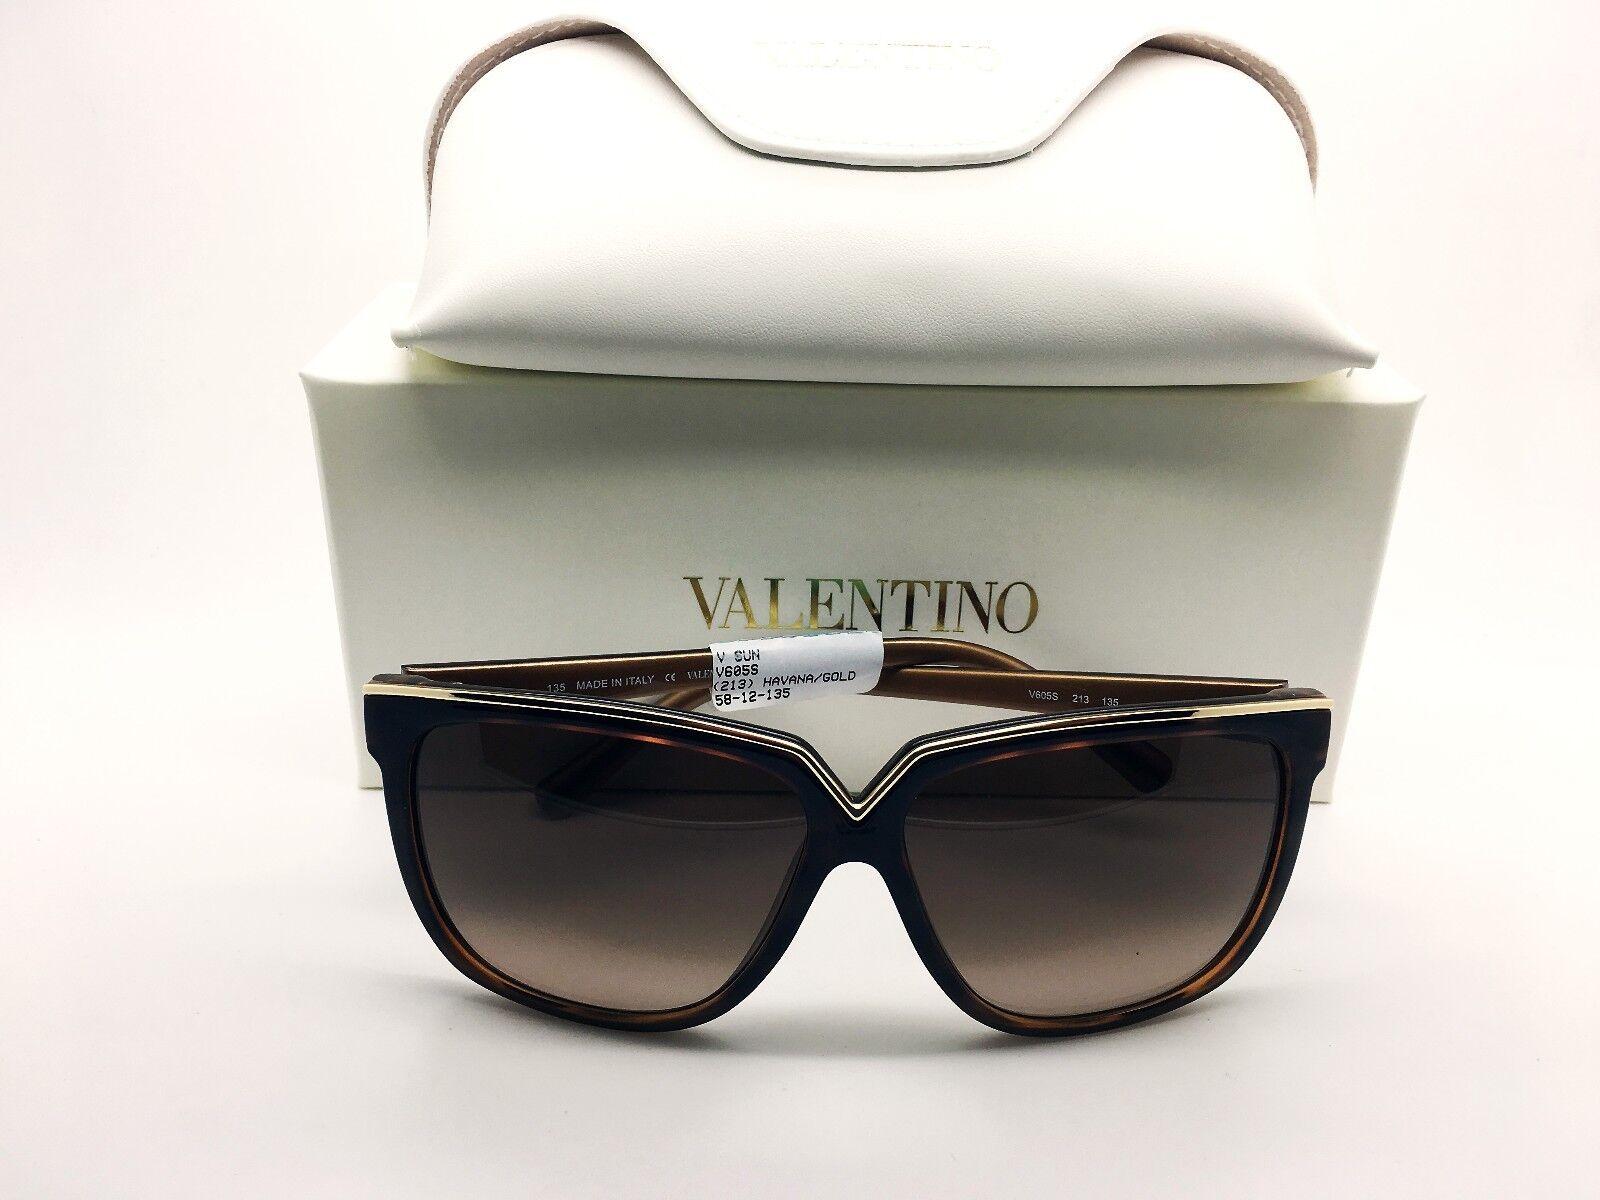 efbfe71fd20 Valentino Sunglasses Women 2017 V605 S Havana  Gold Made in Italy  Authentic+Case